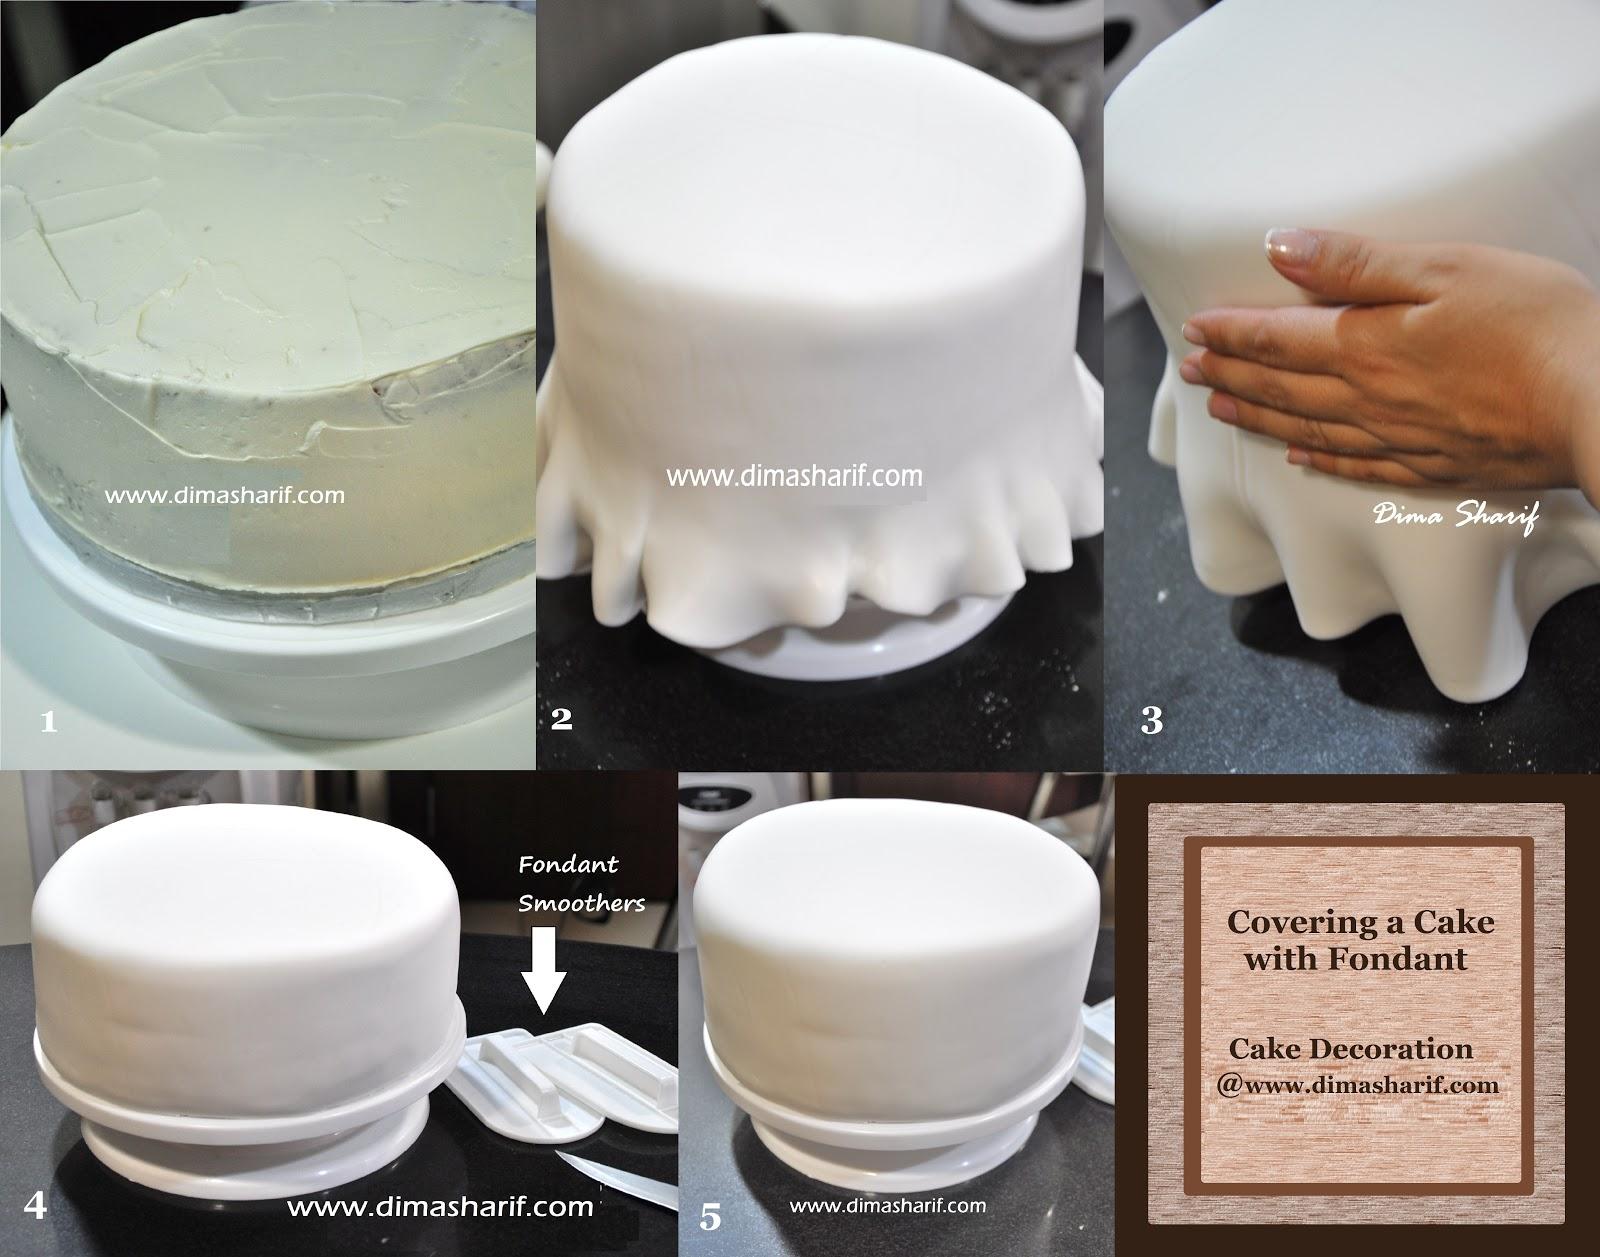 Cake Decorating Course Harrow : Pin Cake Decorating Classesaa?a?a??prepaa?a?a?? a  The ...